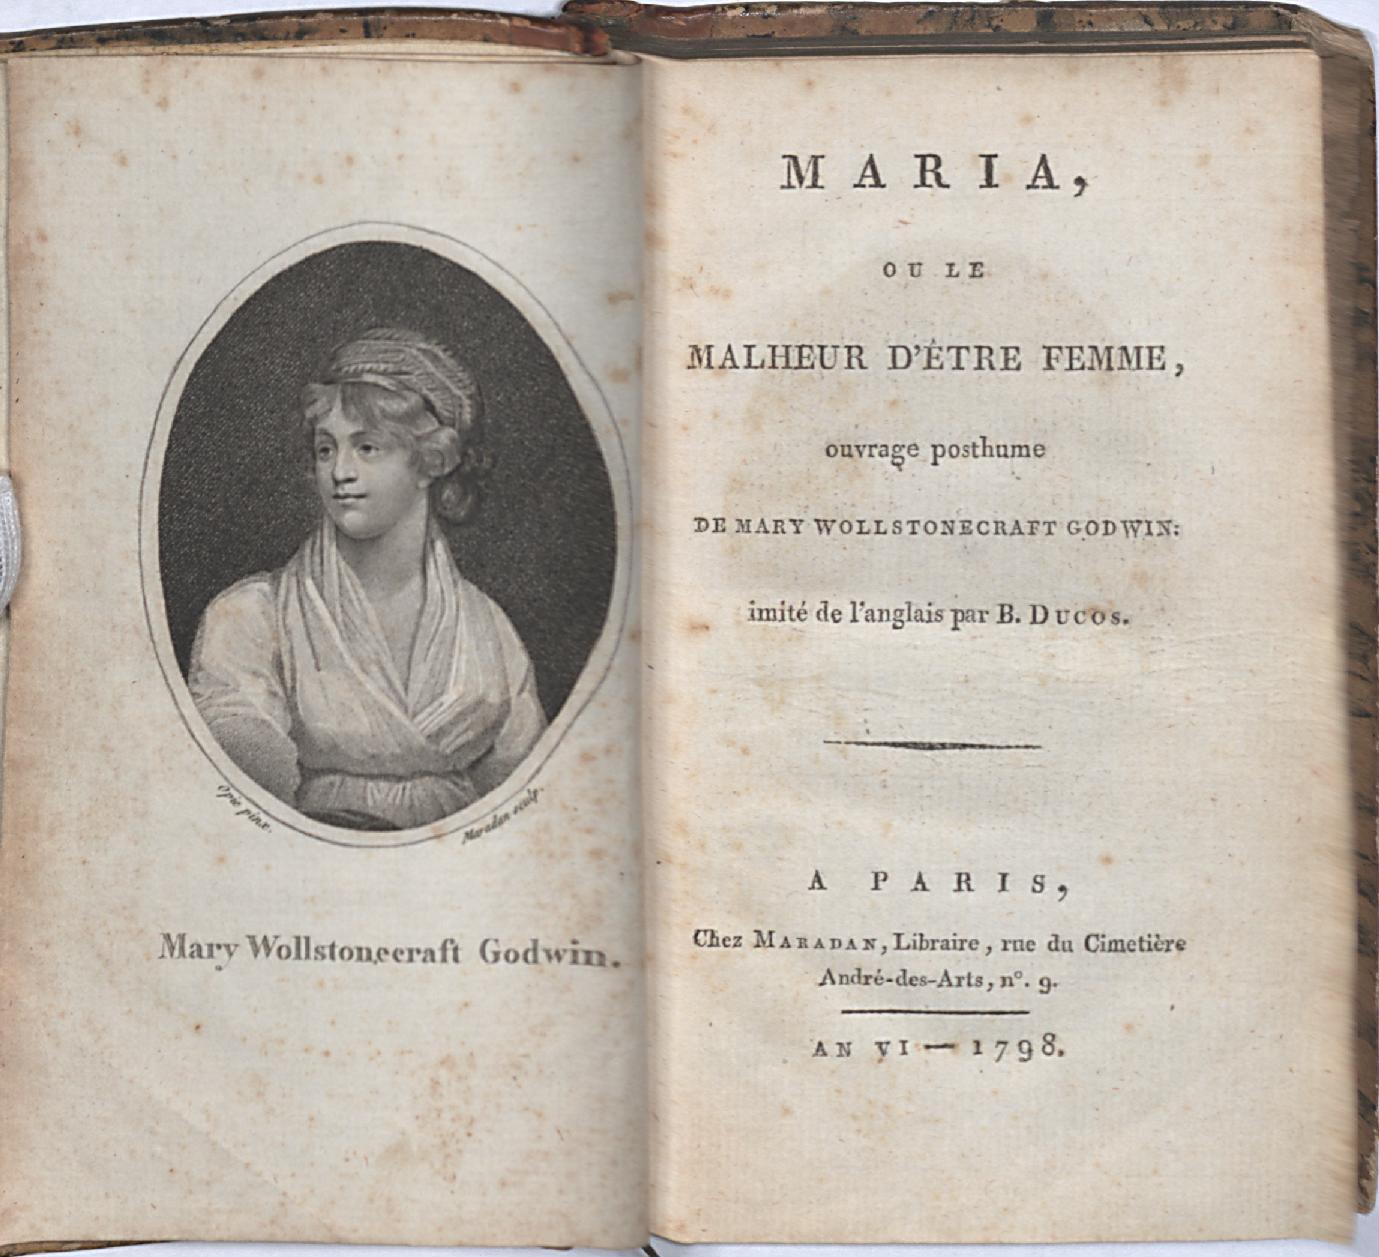 http://blogs.princeton.edu/rarebooks/images/1798.jpg